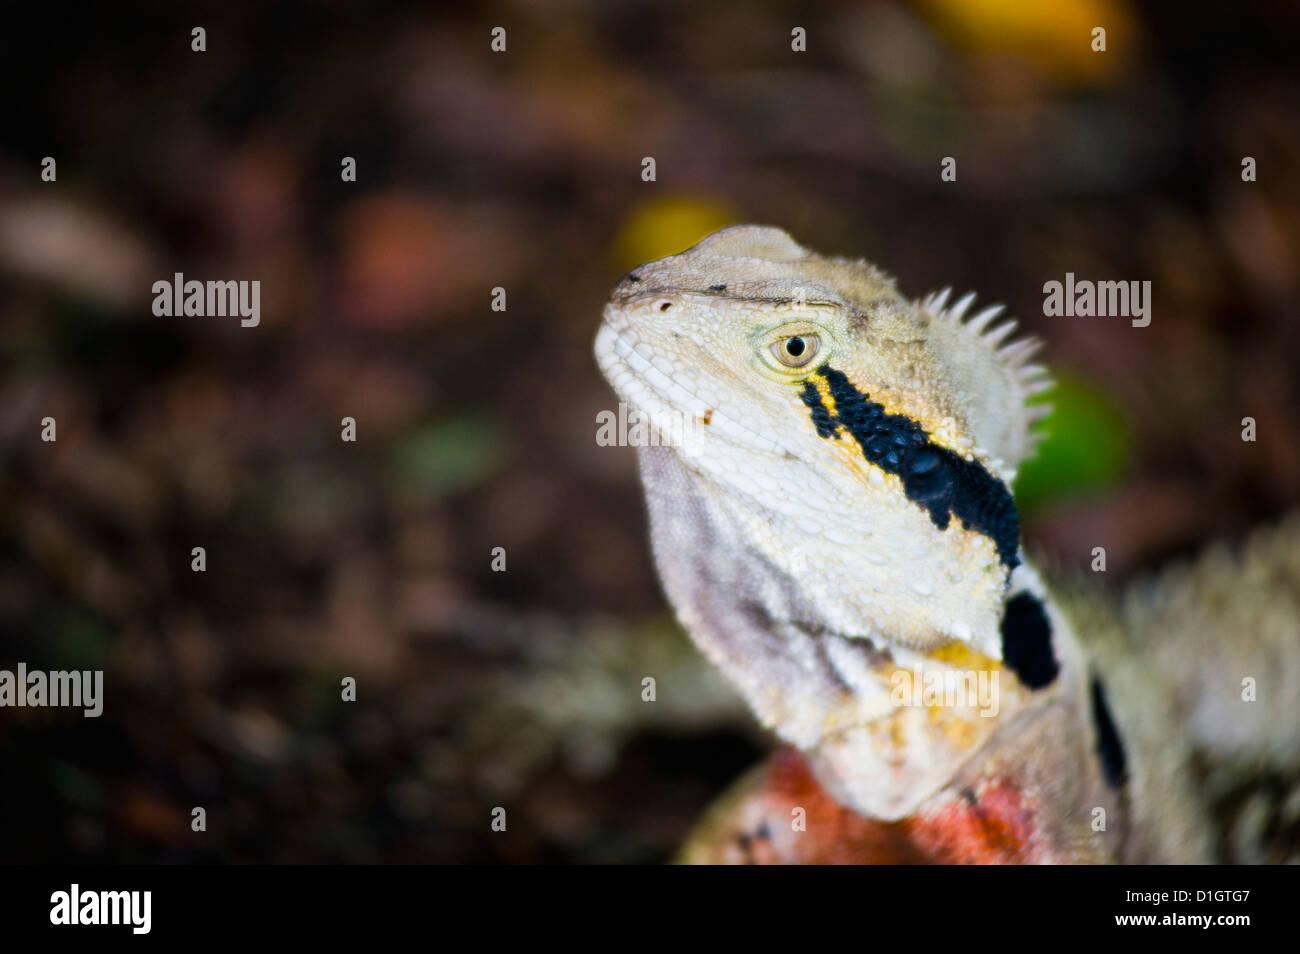 Australian eastern water dragon (Physignathus lesueurii) in Brisbane Botanical Gardens, Queensland, Australia, Pacific - Stock Image